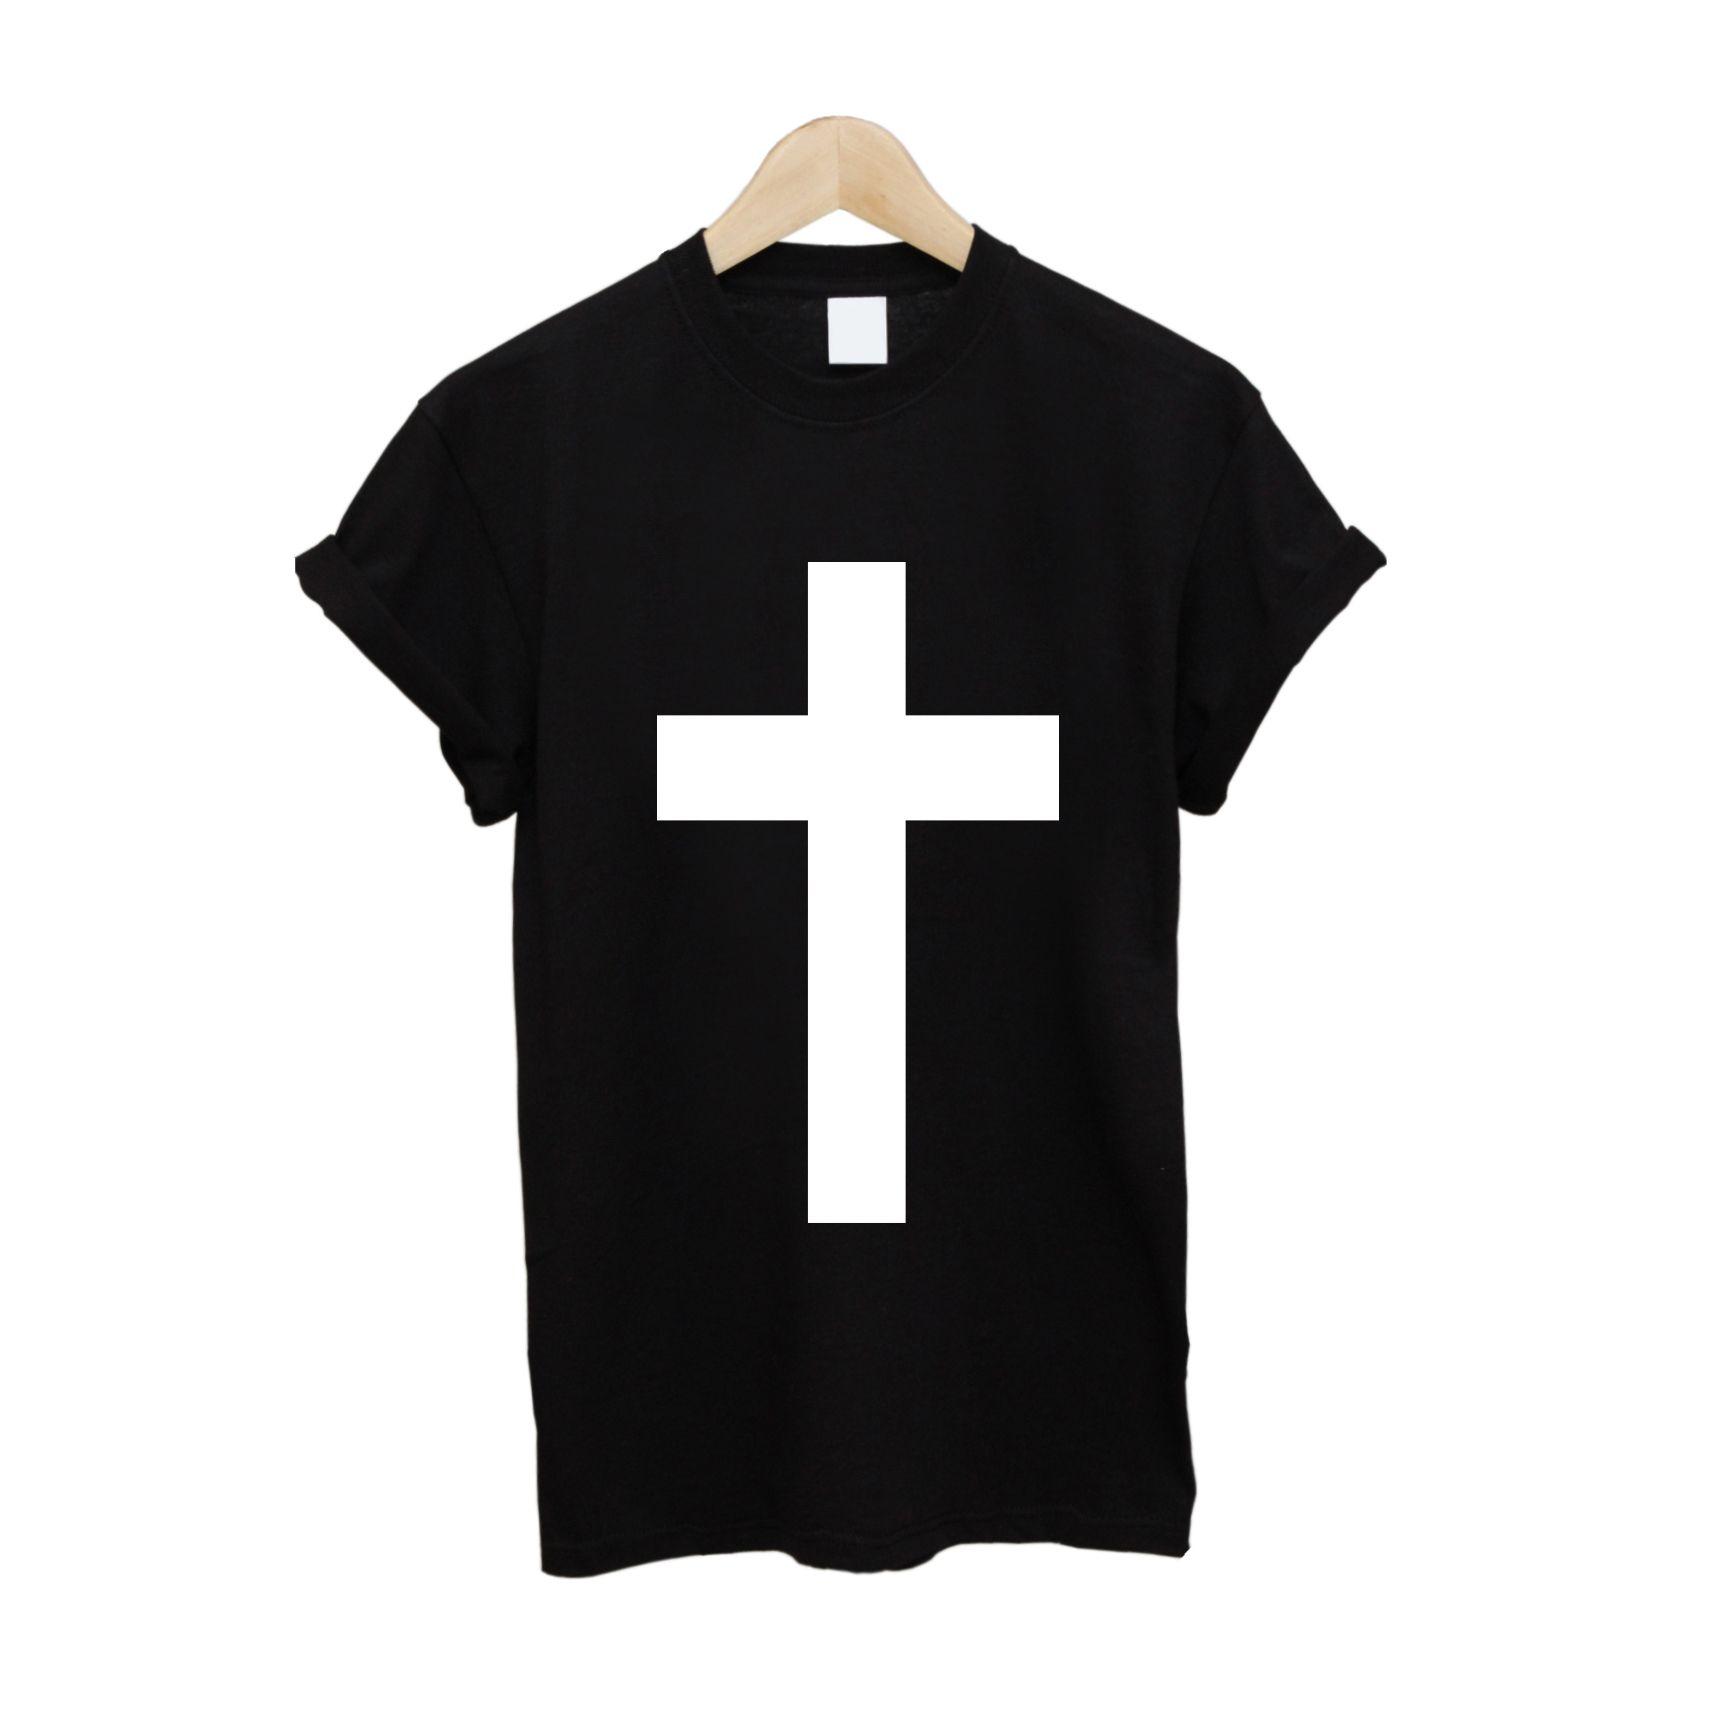 Black t shirt white cross - Christian Cross T Shirt 10 Free Uk Delivery Teeisland